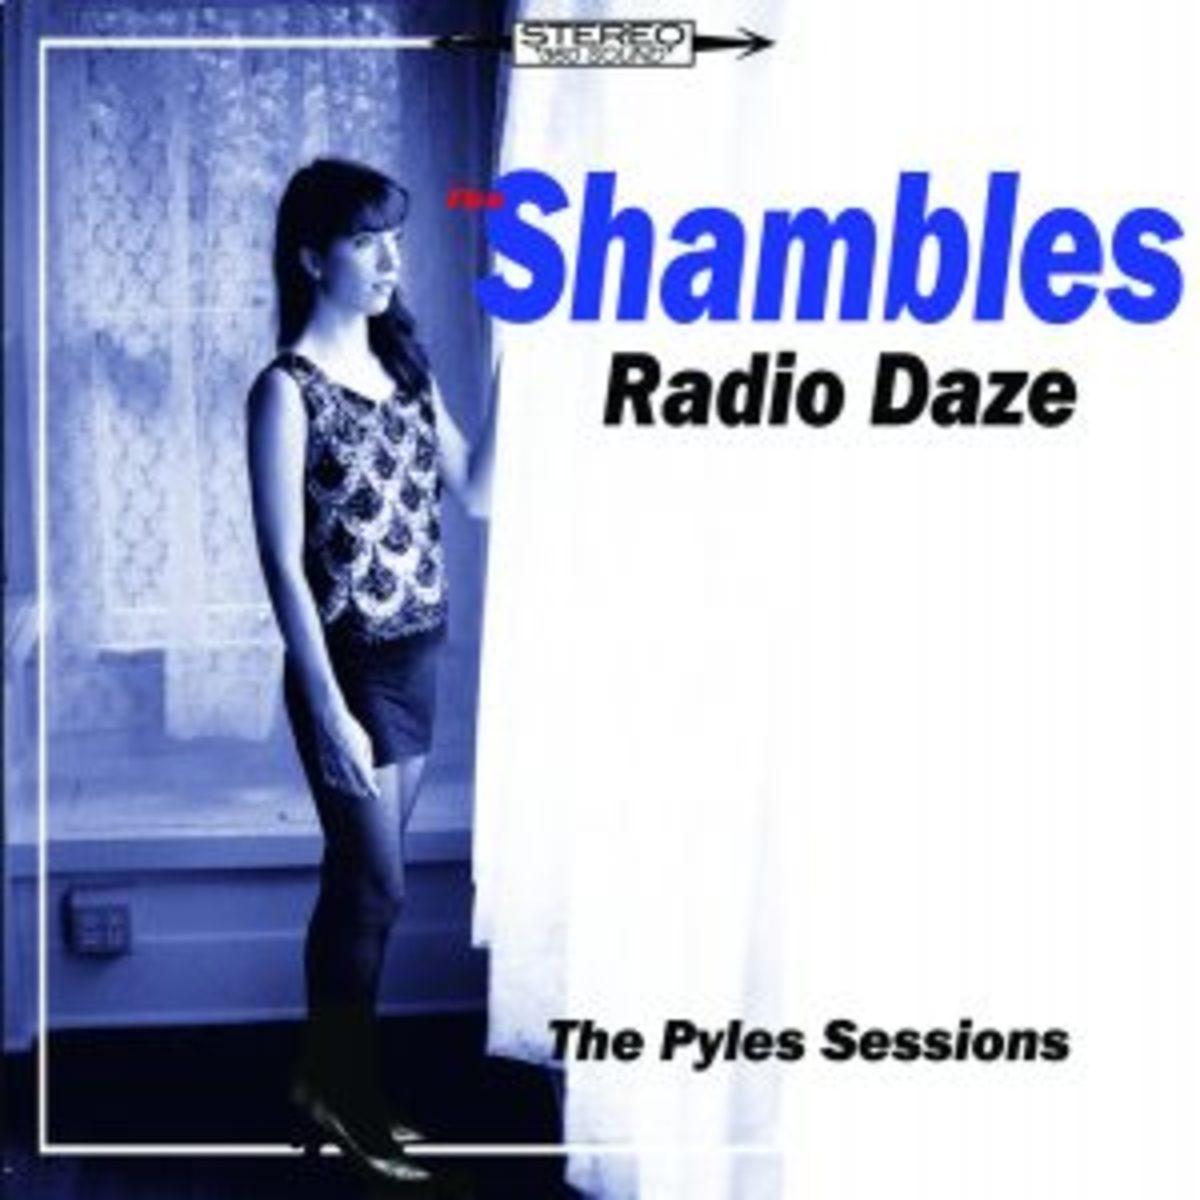 SHAMBLES RADIO DAZE